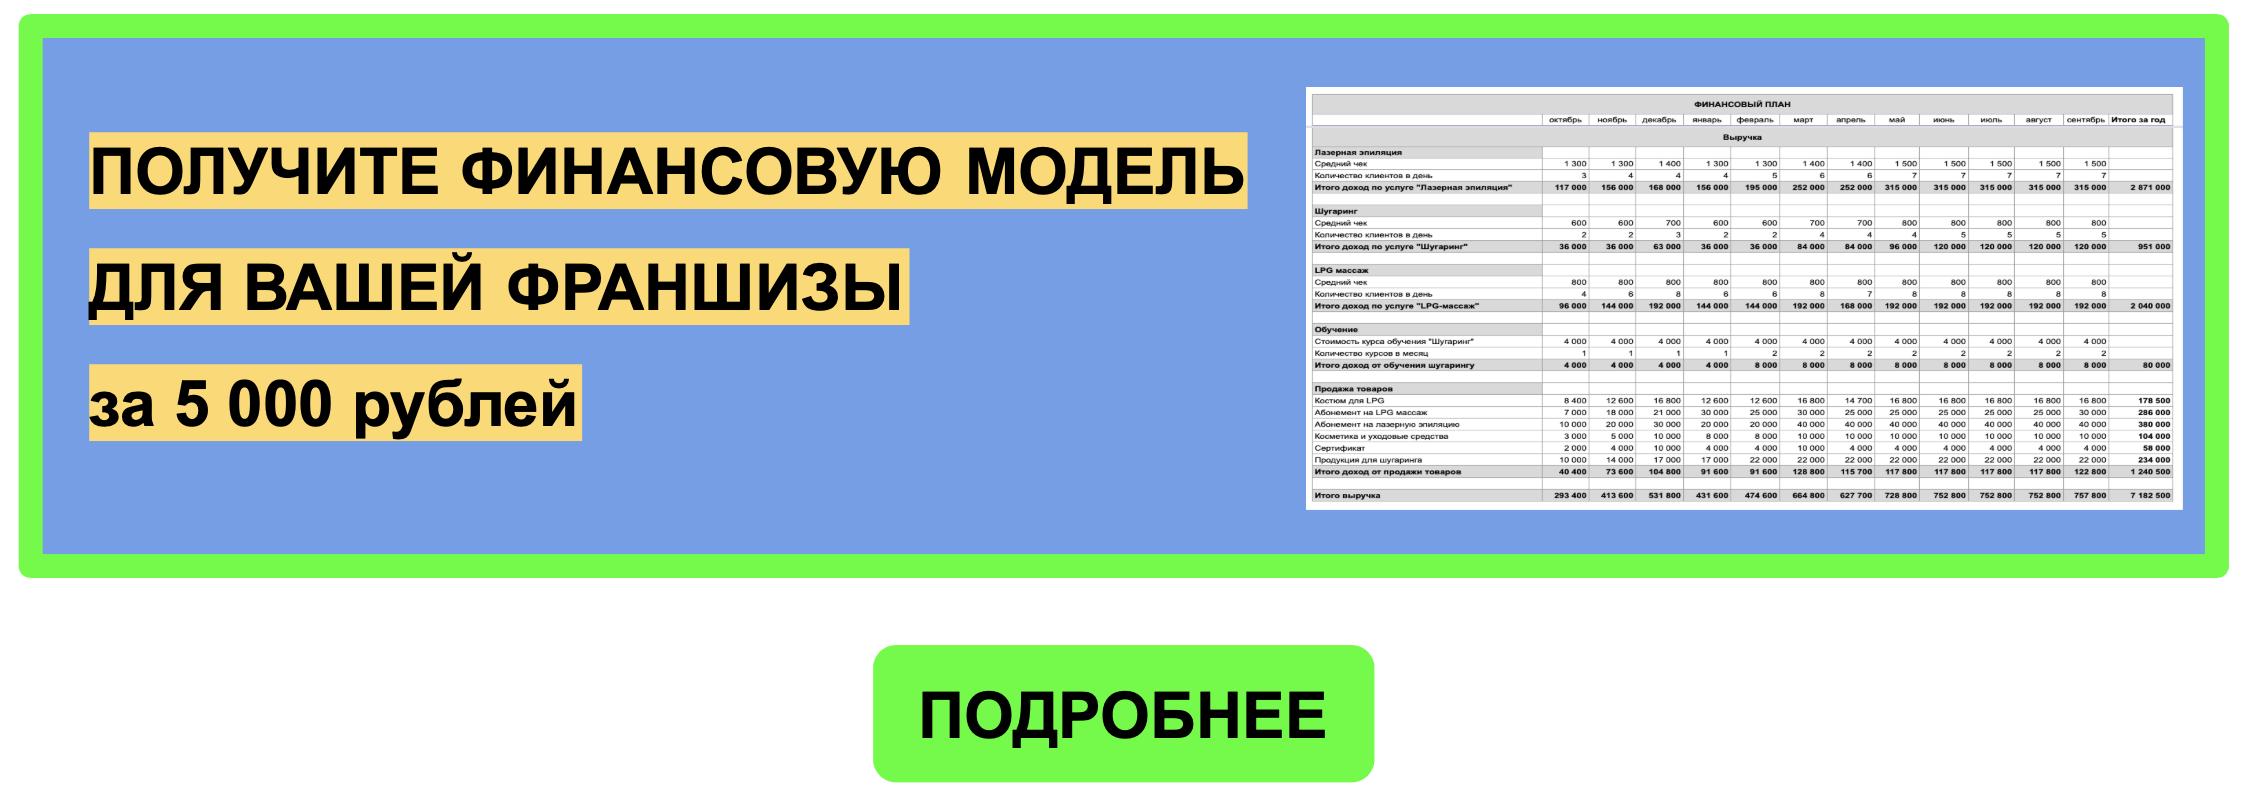 usluga-finansovaya-model-franshiza